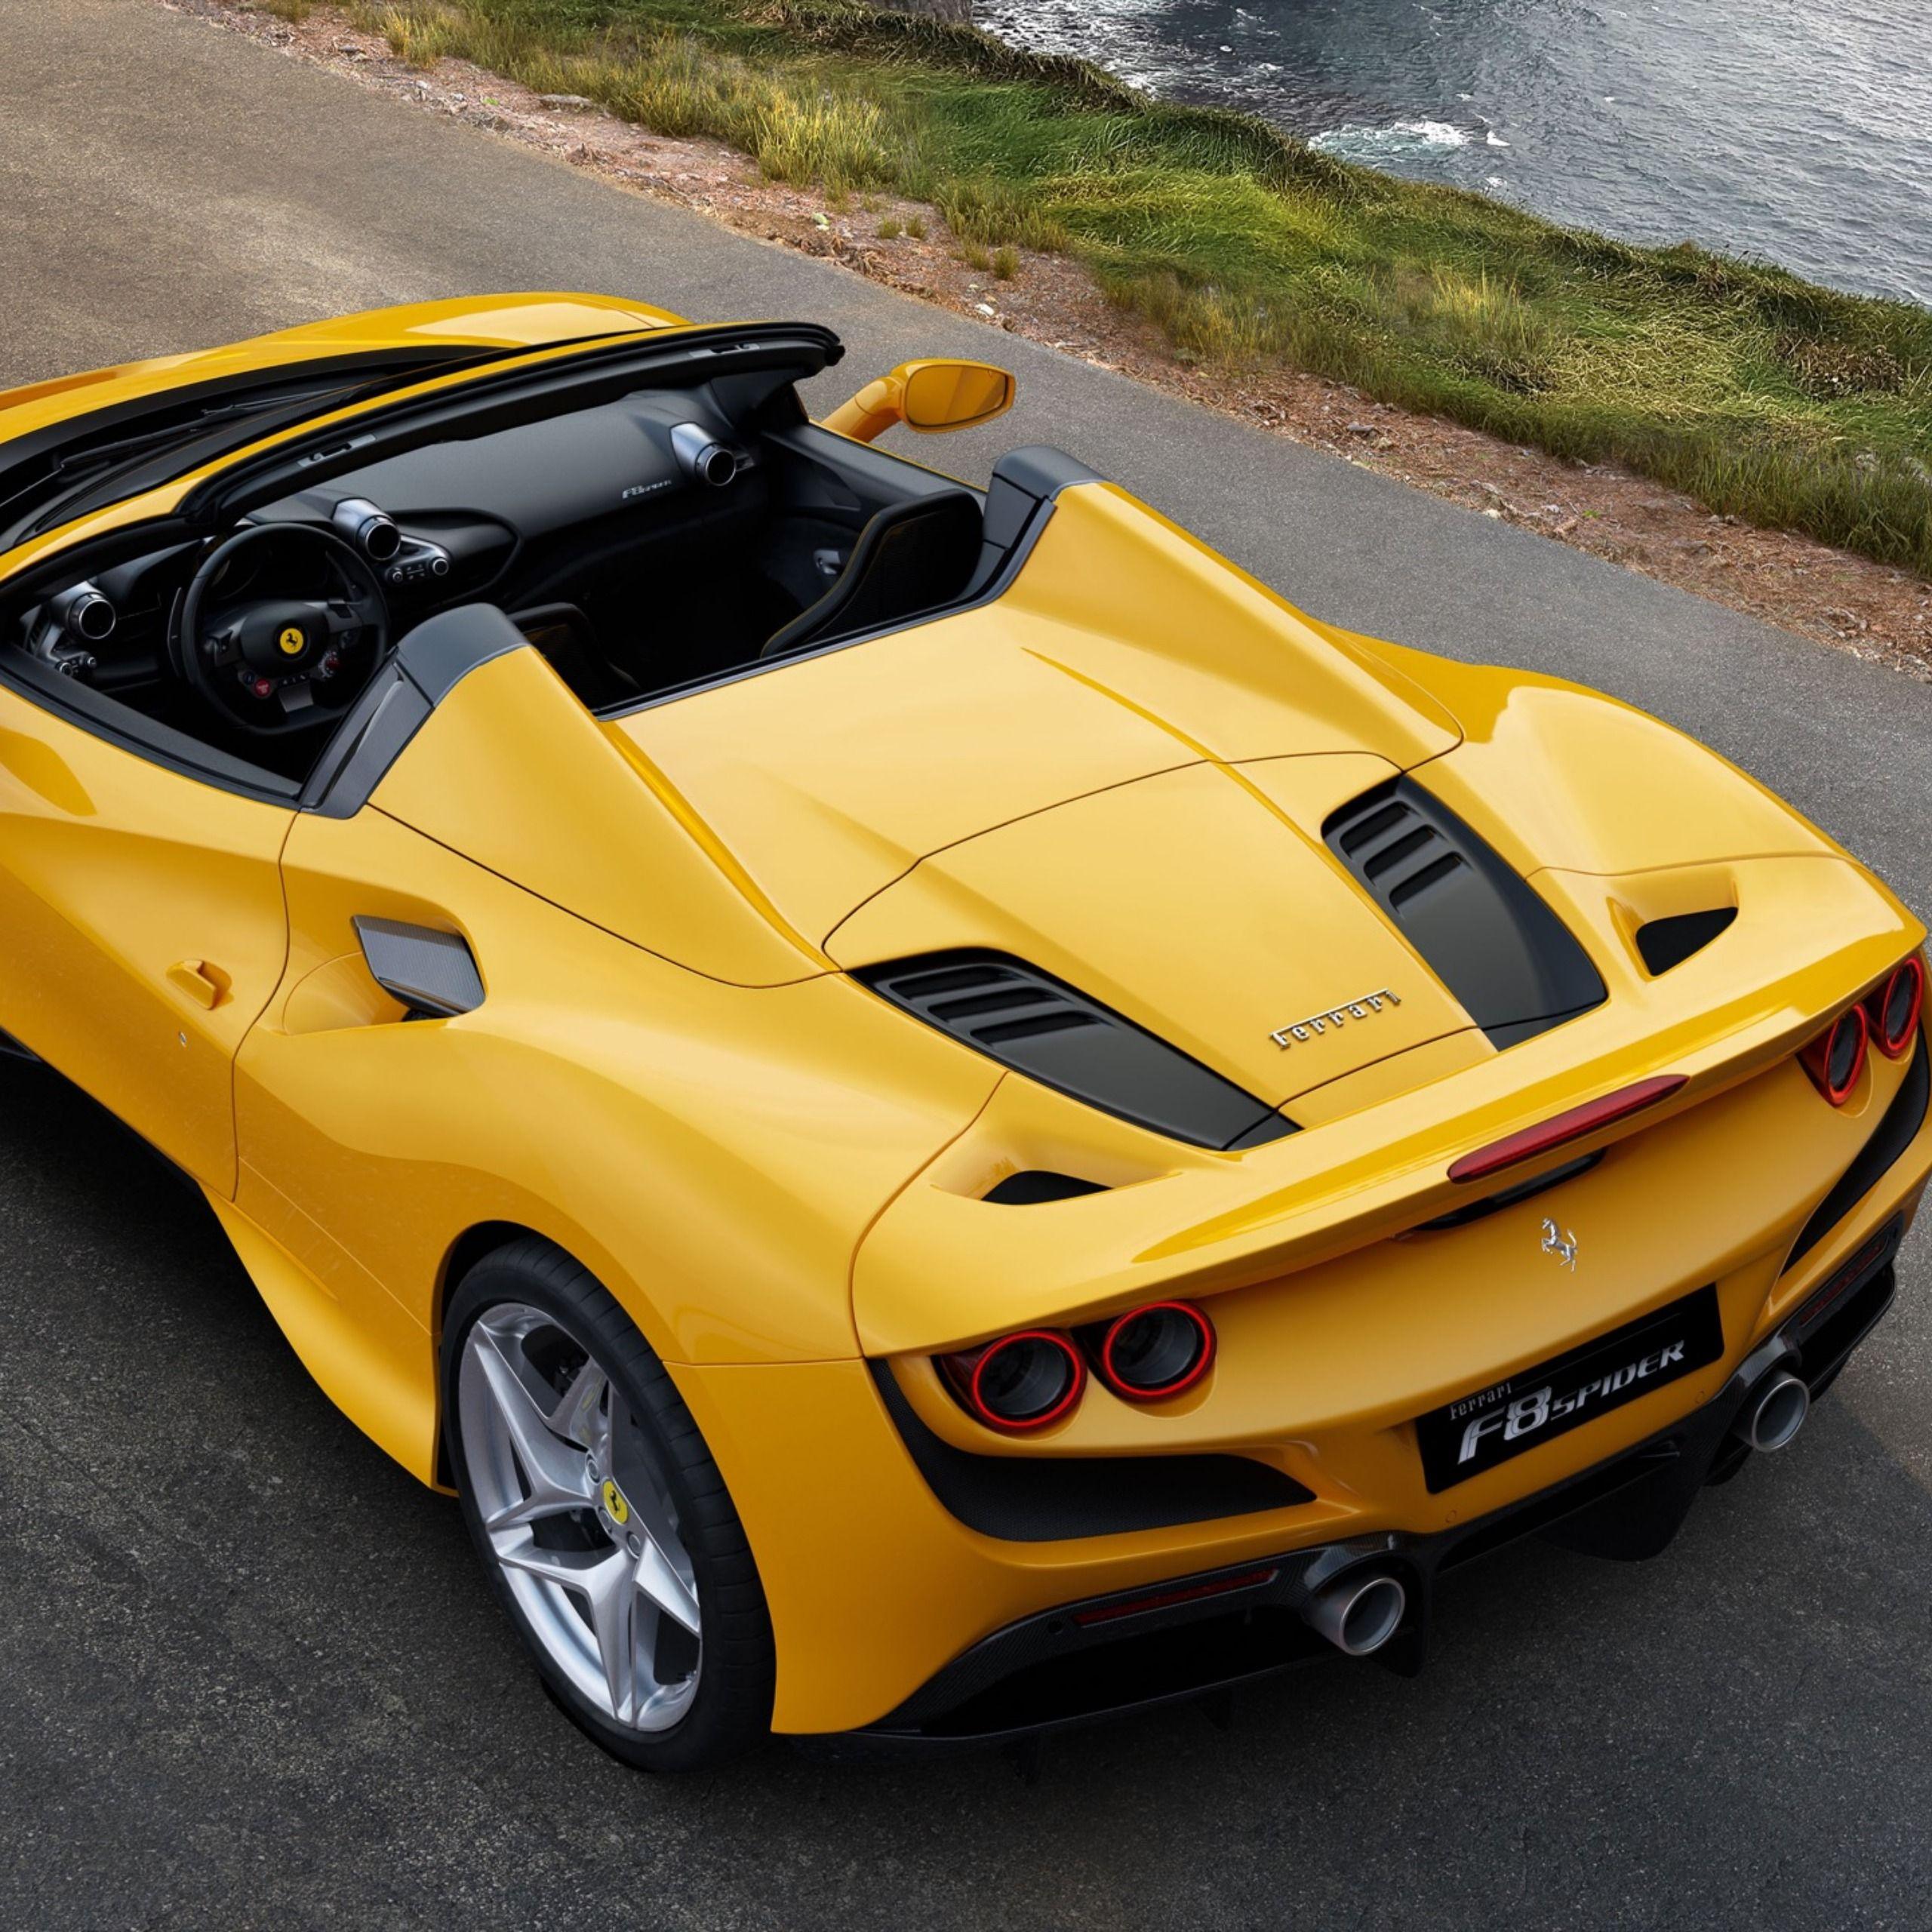 2020 Ferrari F8 Spider Revealed For Frankfurt Motor Show In 2020 New Ferrari Top Sports Cars Super Cars